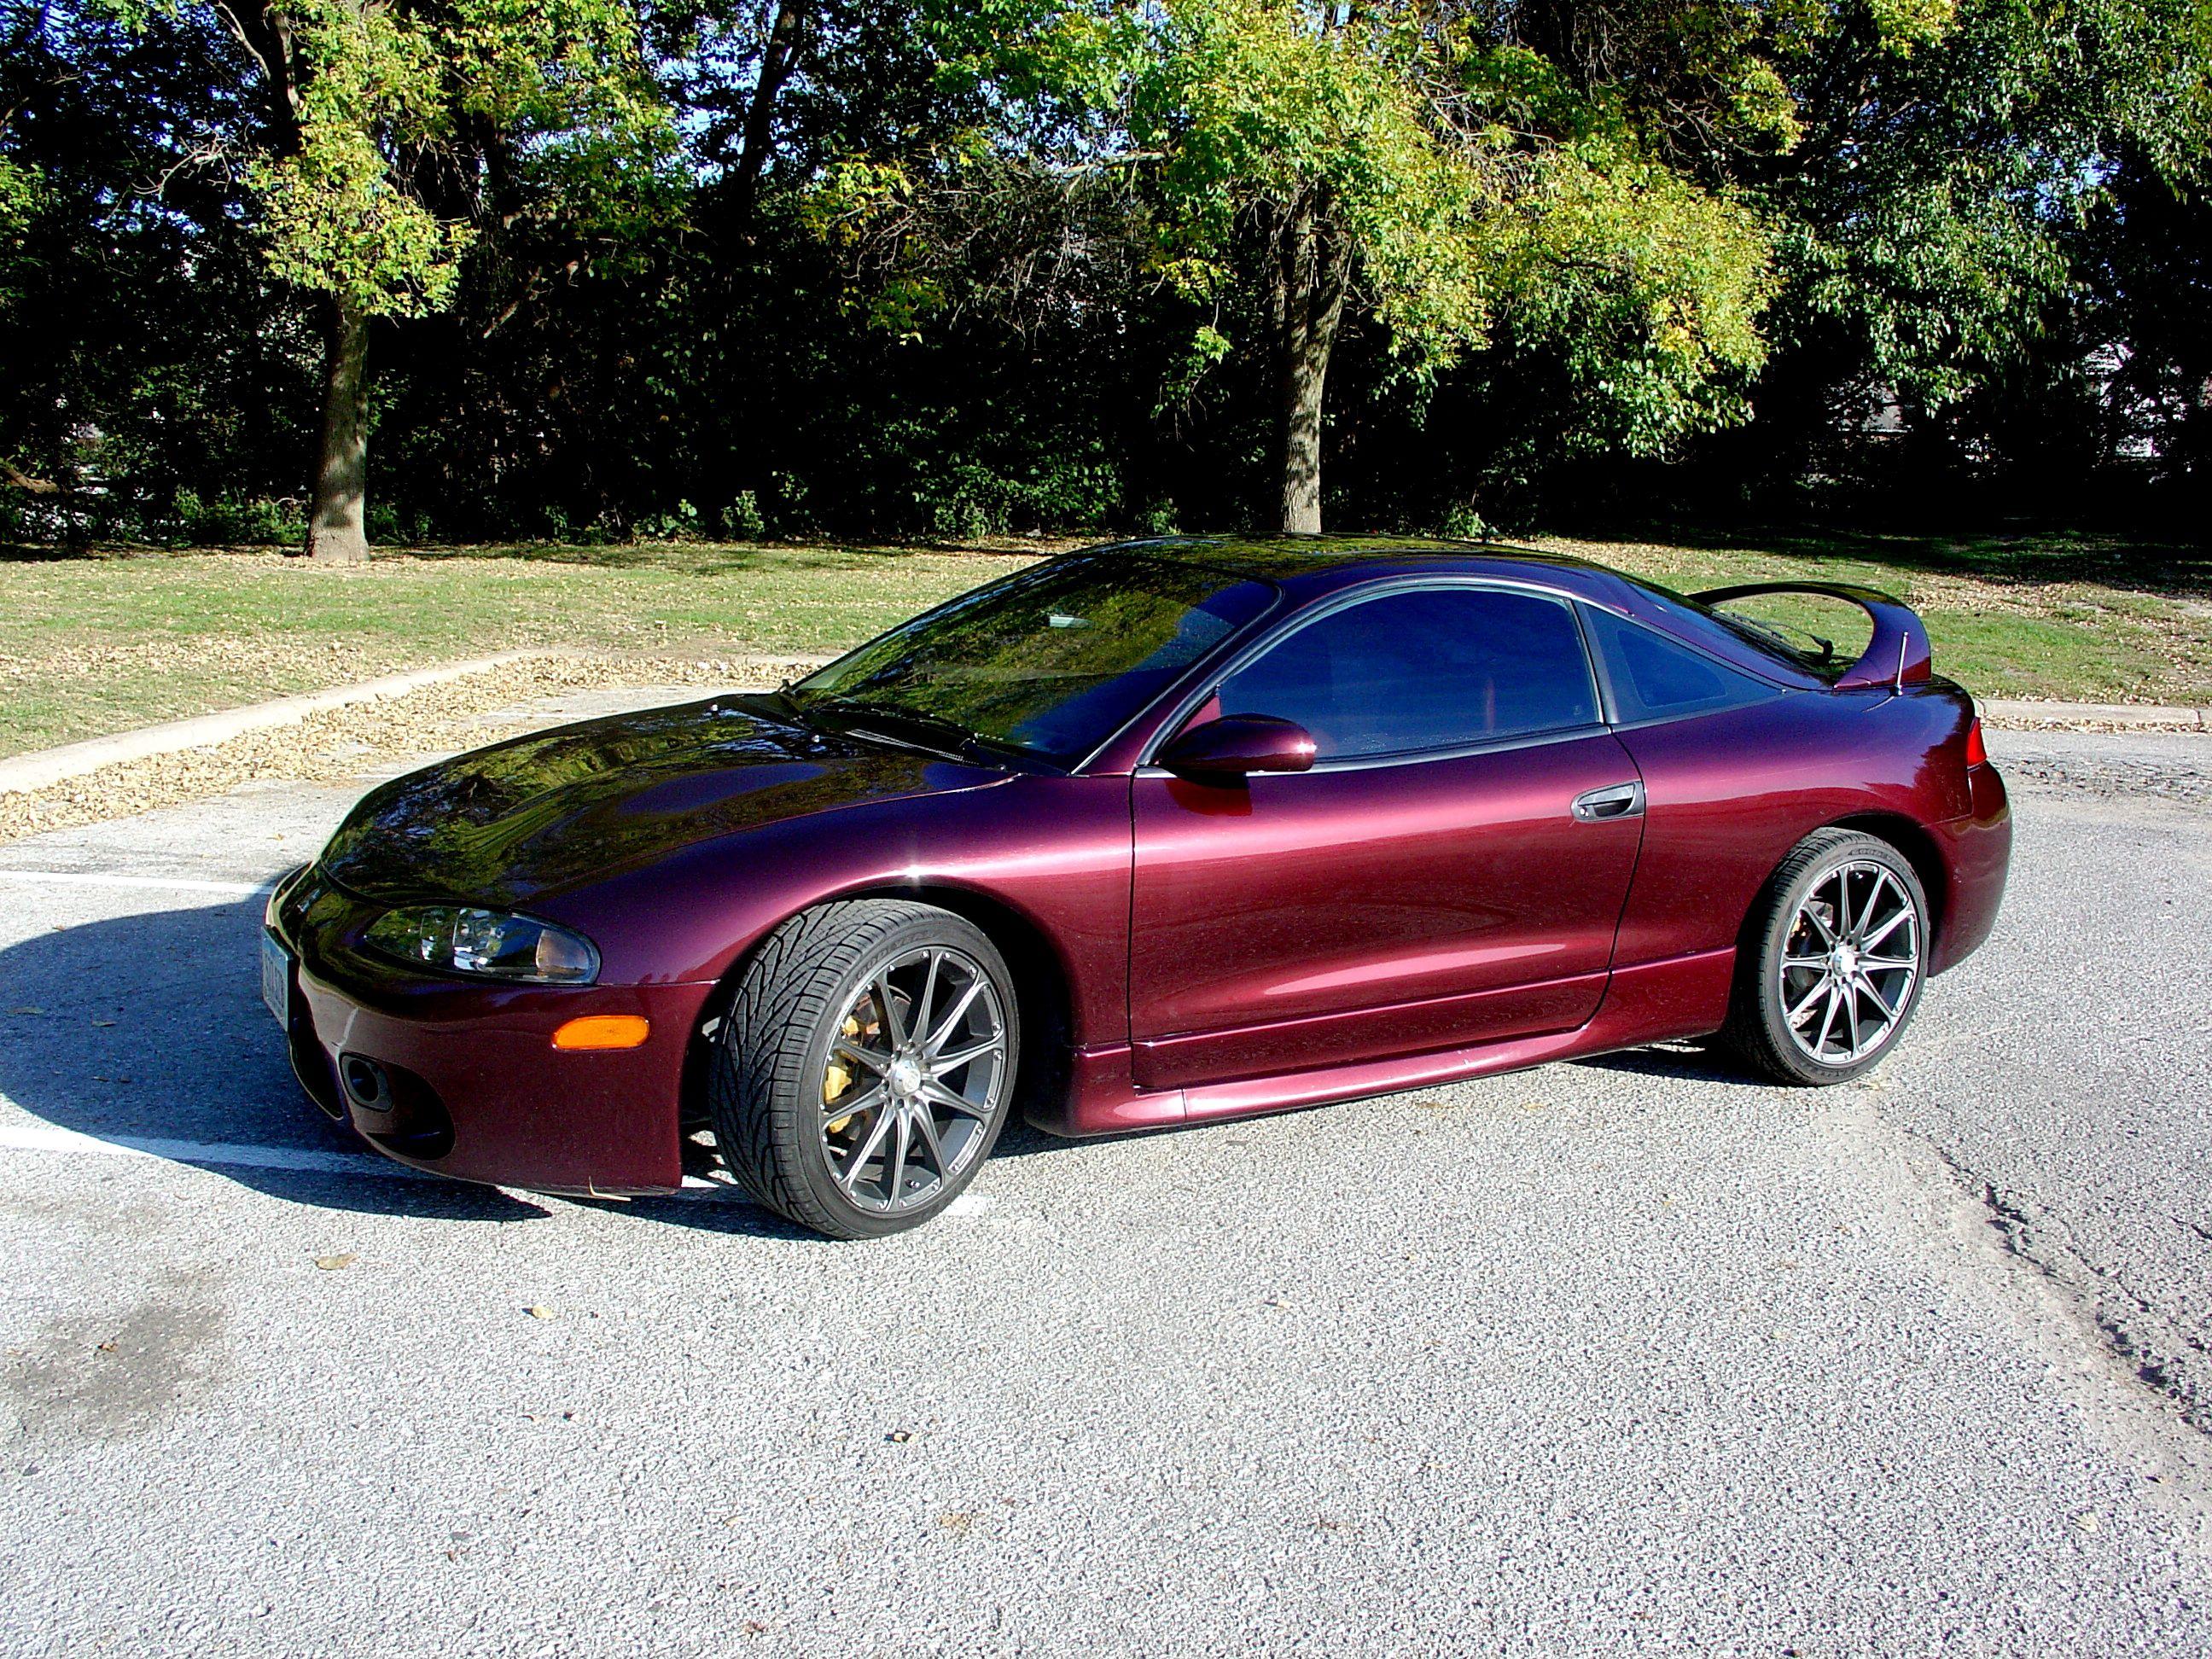 1998 Eclipse Turbo Gst Gst Eclipse Dr 1998 2 Mitsubishi Mitsubishi